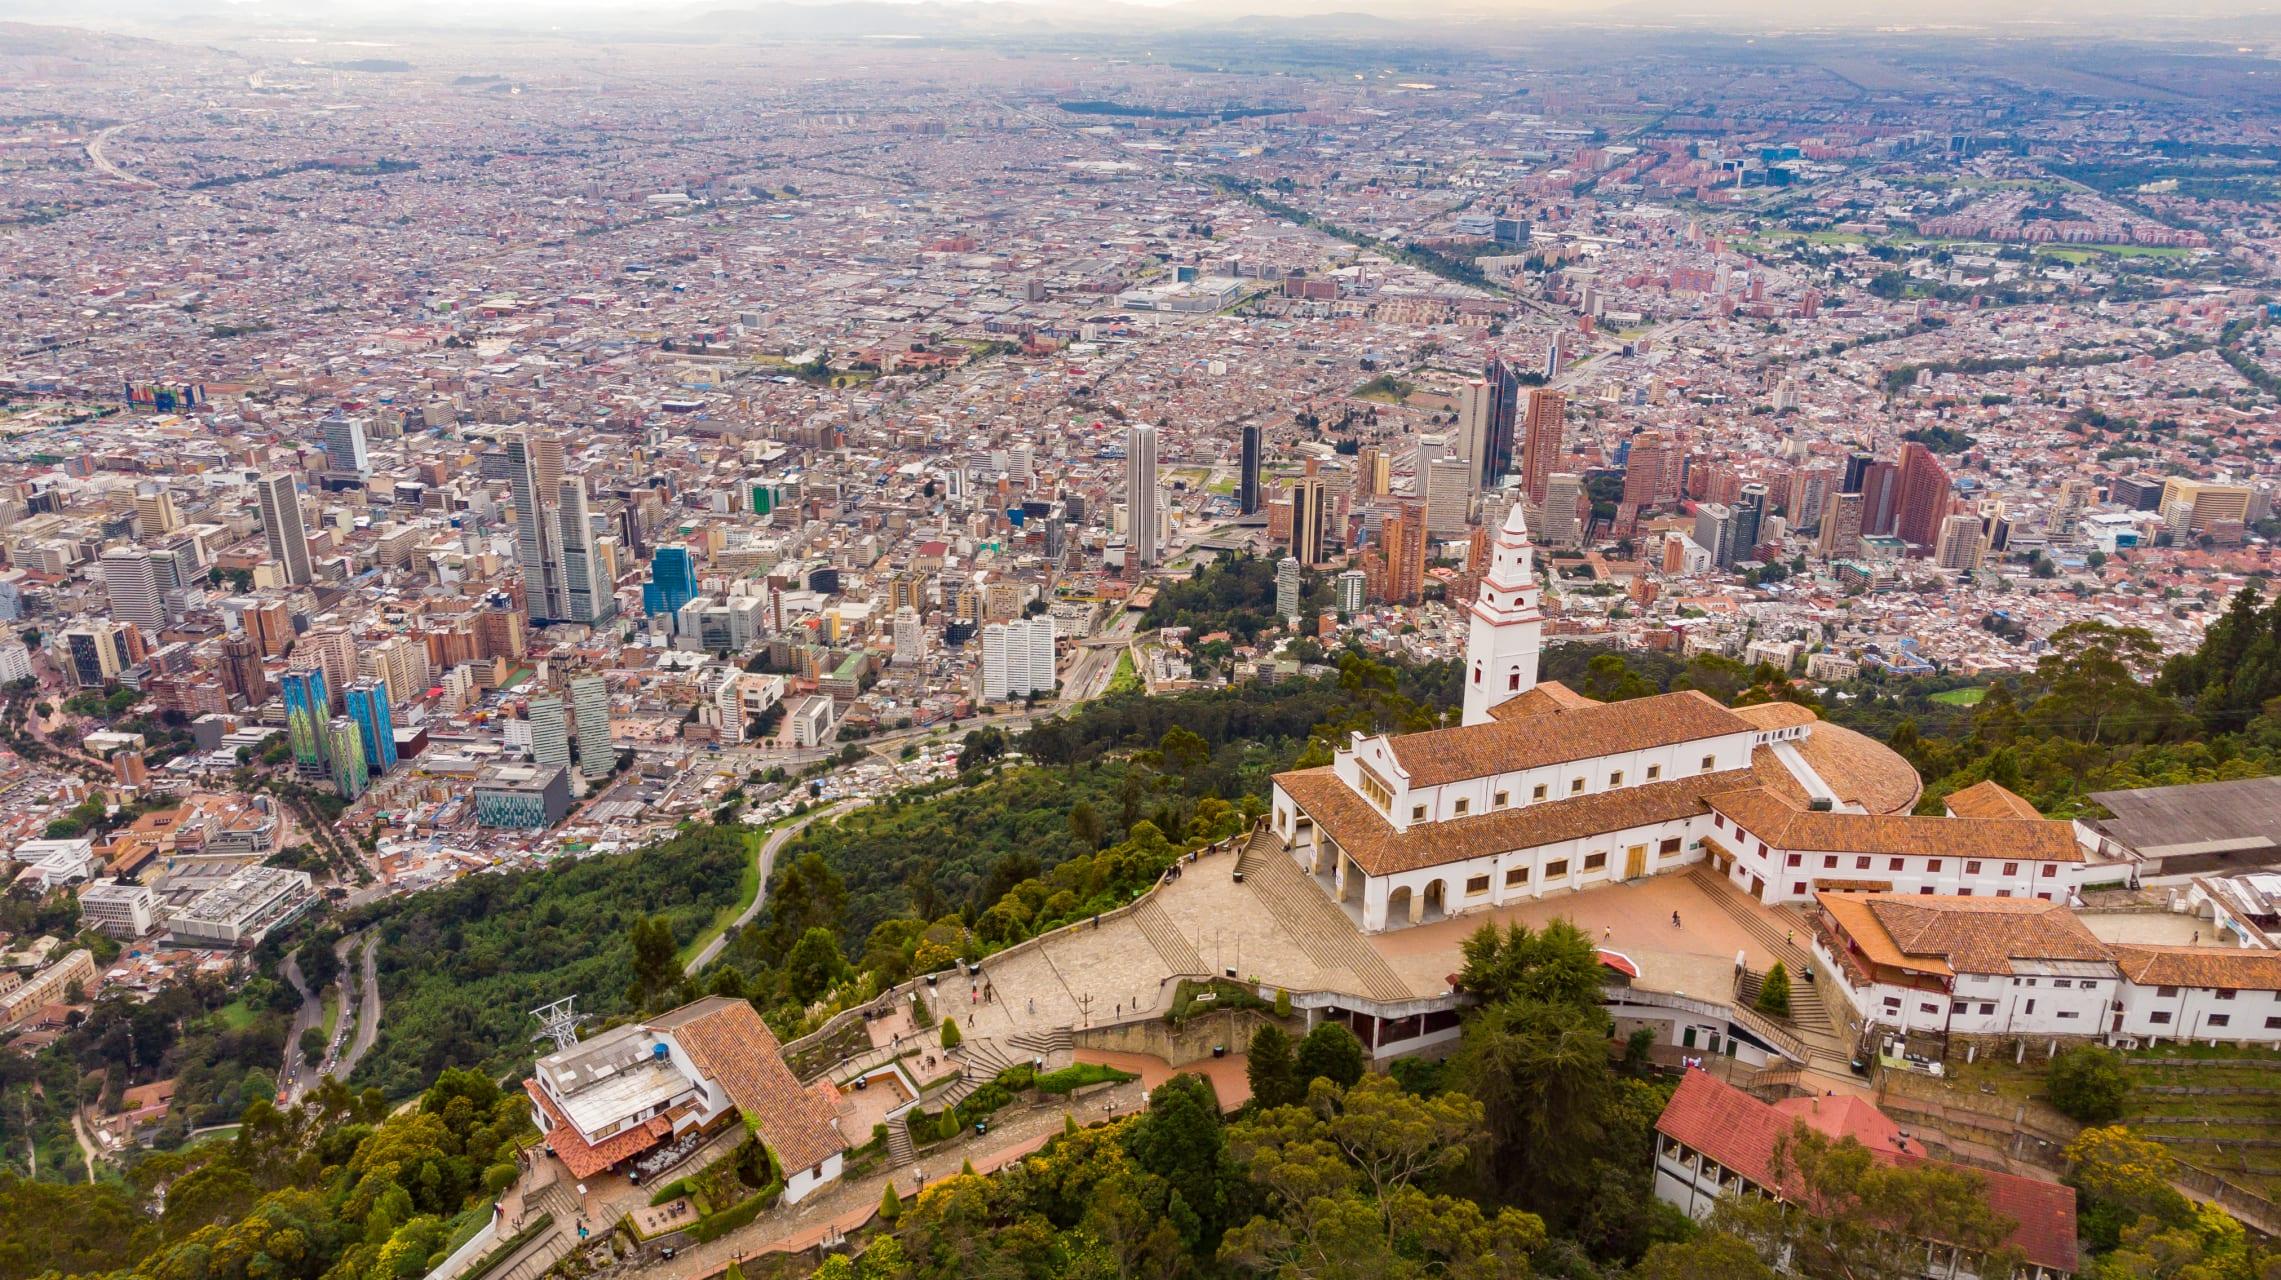 Bogota cover image